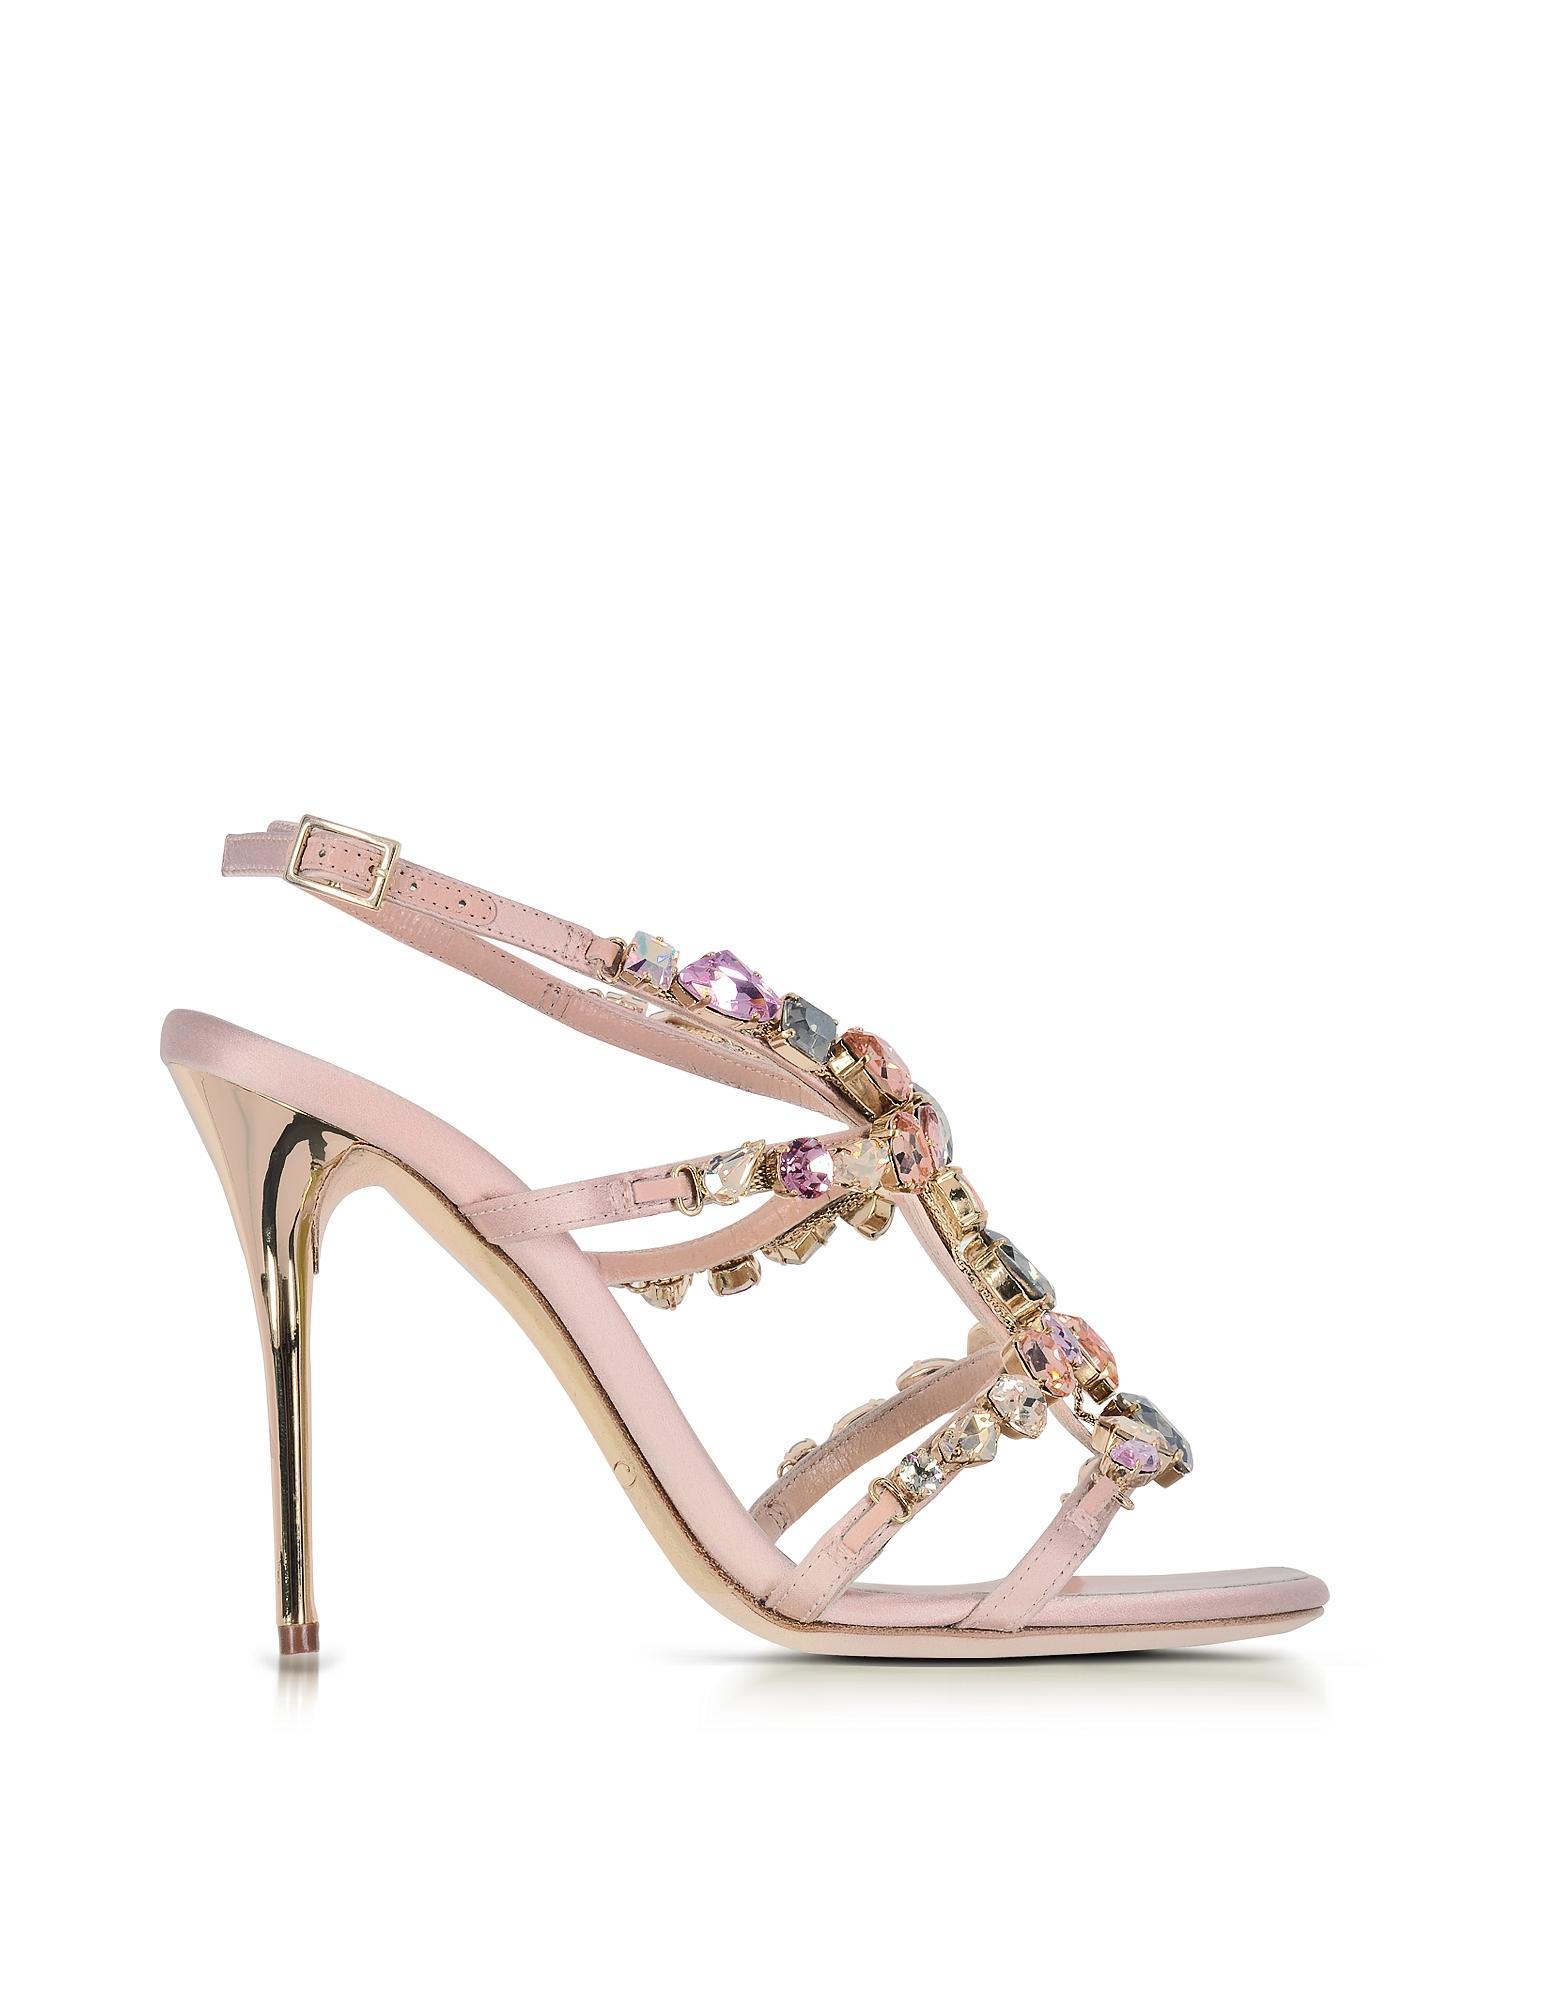 Oscar de la Renta Imogene Crystal Stiletto Sandal HKGikEa8